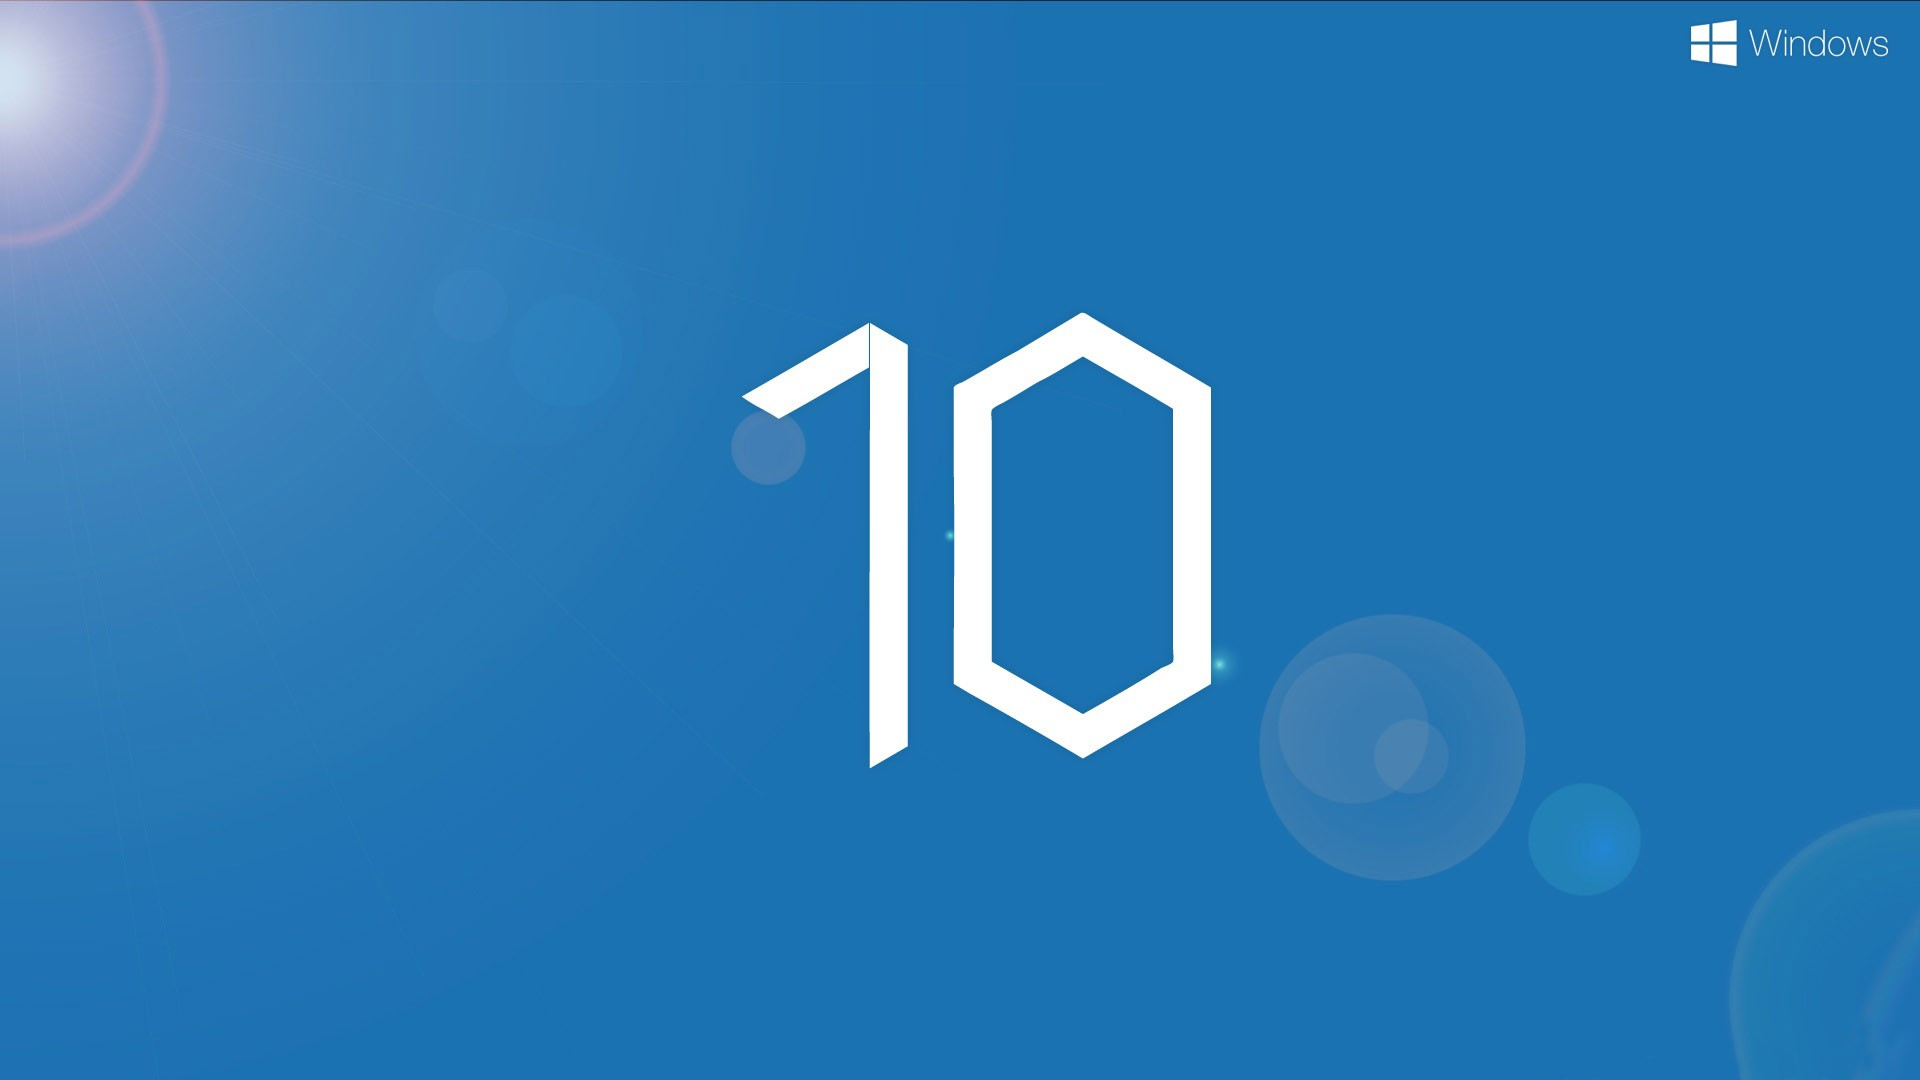 3d Wallpaper Download For Windows 10 Windows 10 Wallpaper Pixelstalk Net